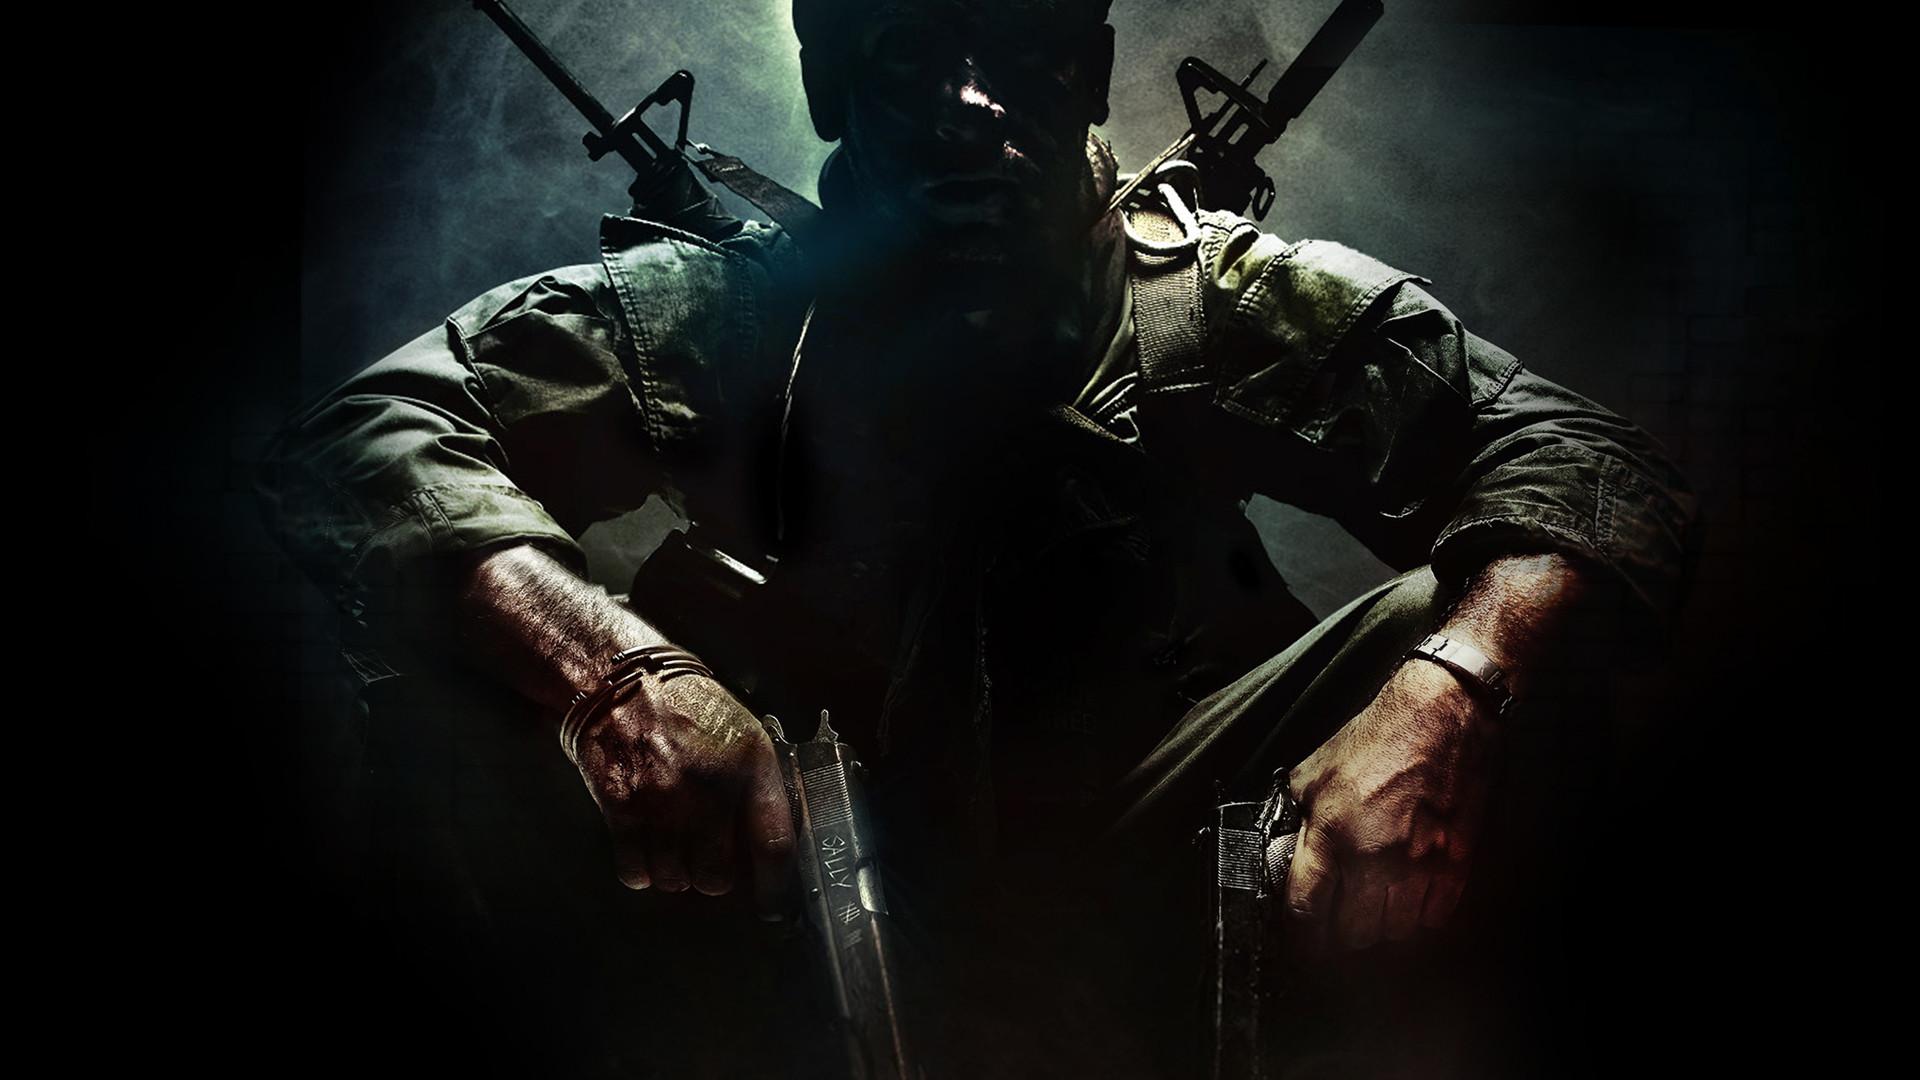 Call of Duty Black Ops Wallpaper HILFE! (Windows 7, Microsoft, Windows .